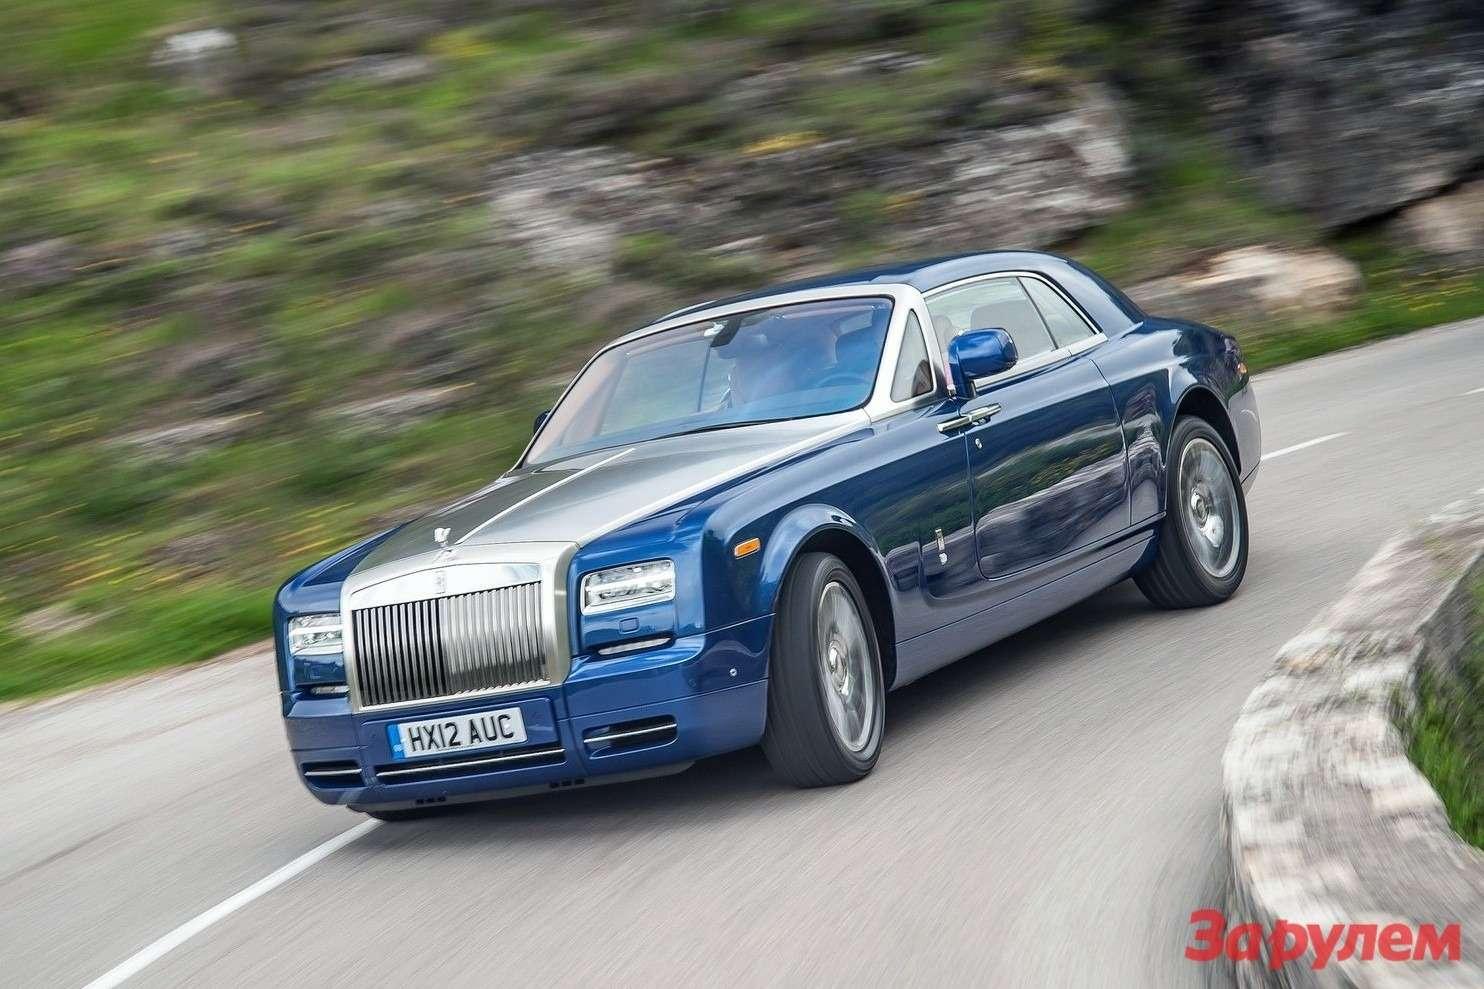 Rolls Royce Phantom Coupe 2013 1600x1200 wallpaper 13